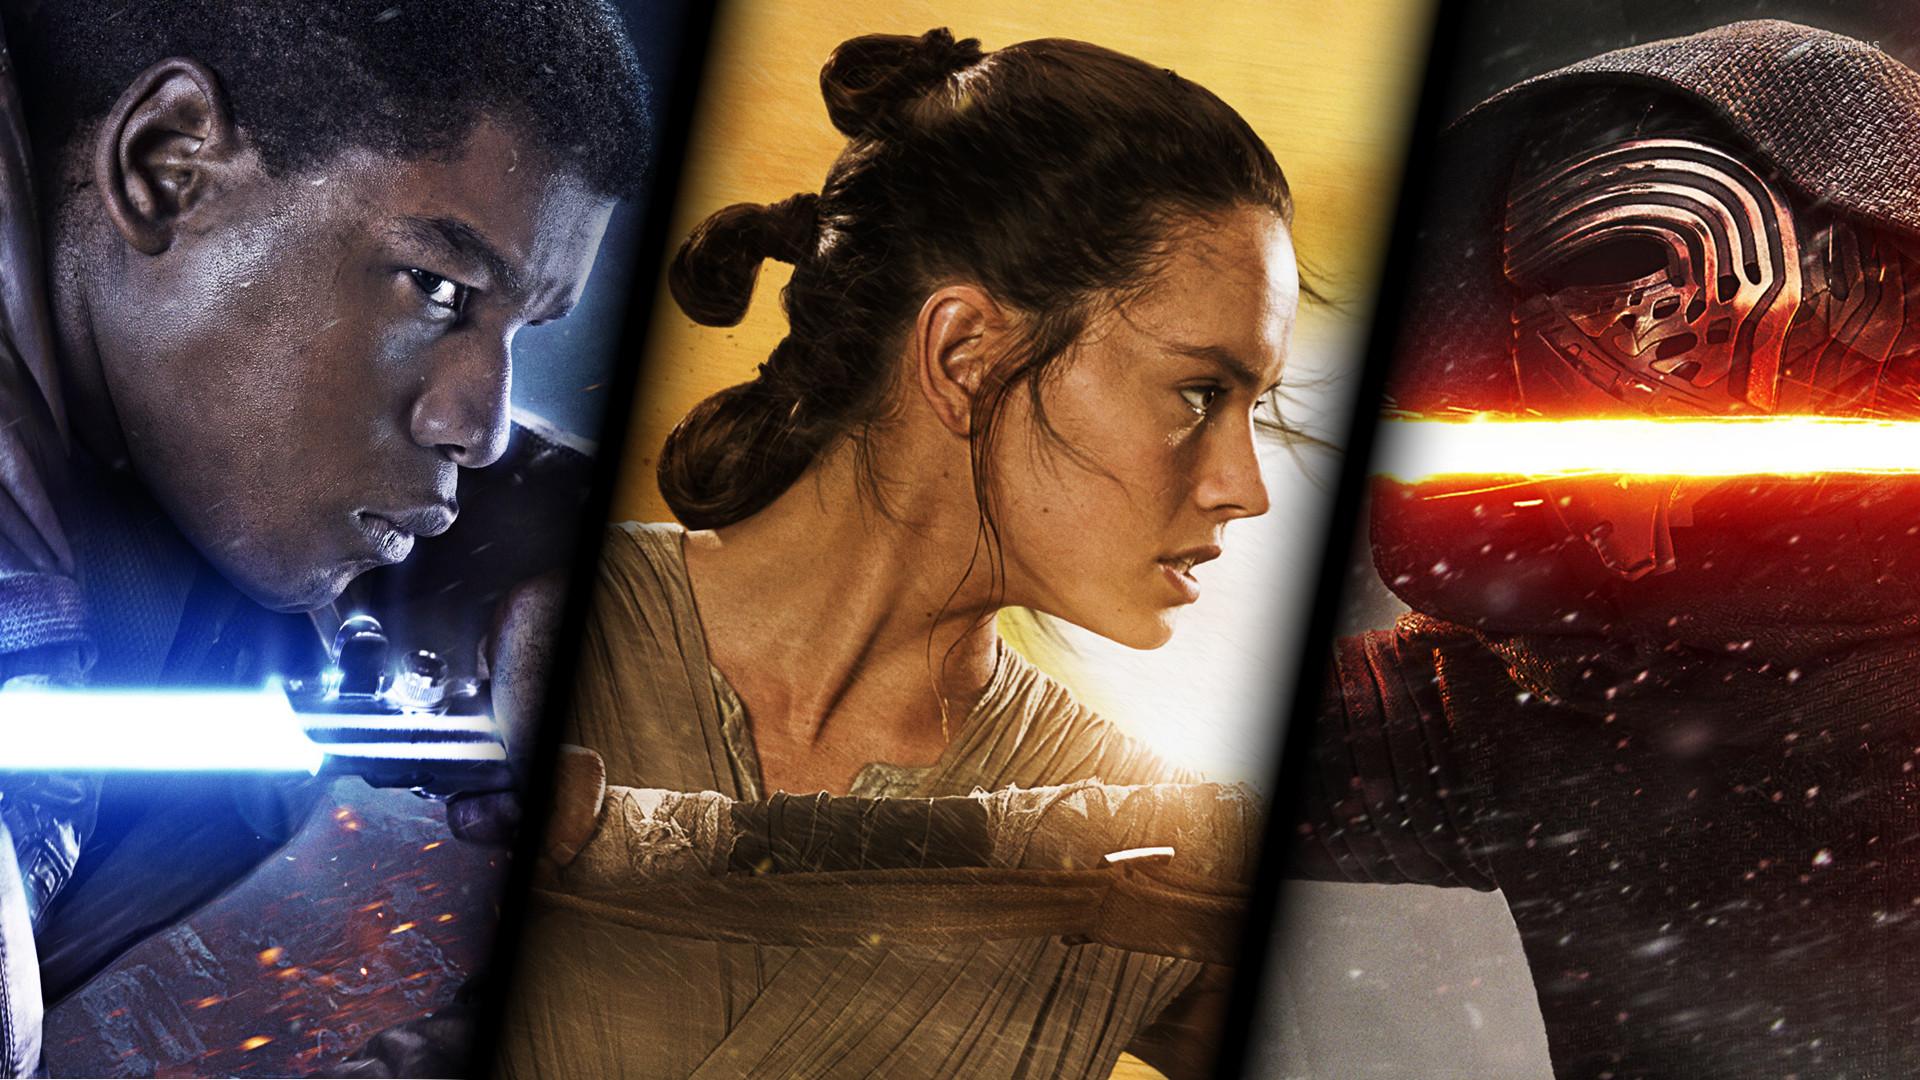 Finn, Rey and Kylo Ren in Star Wars: The Force Awakens wallpaper